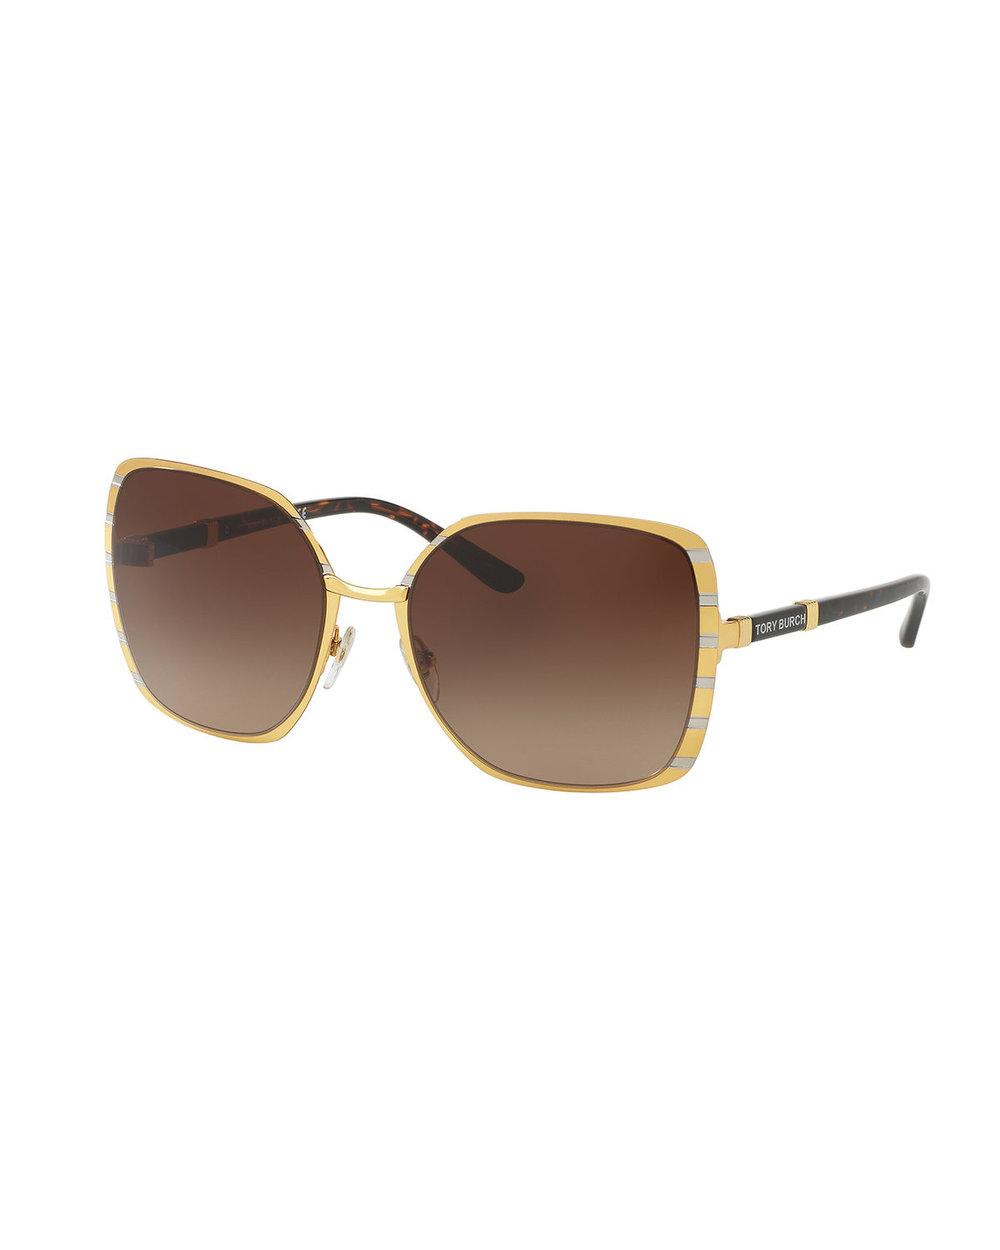 Tory Burch Square Metal Sunglasses -